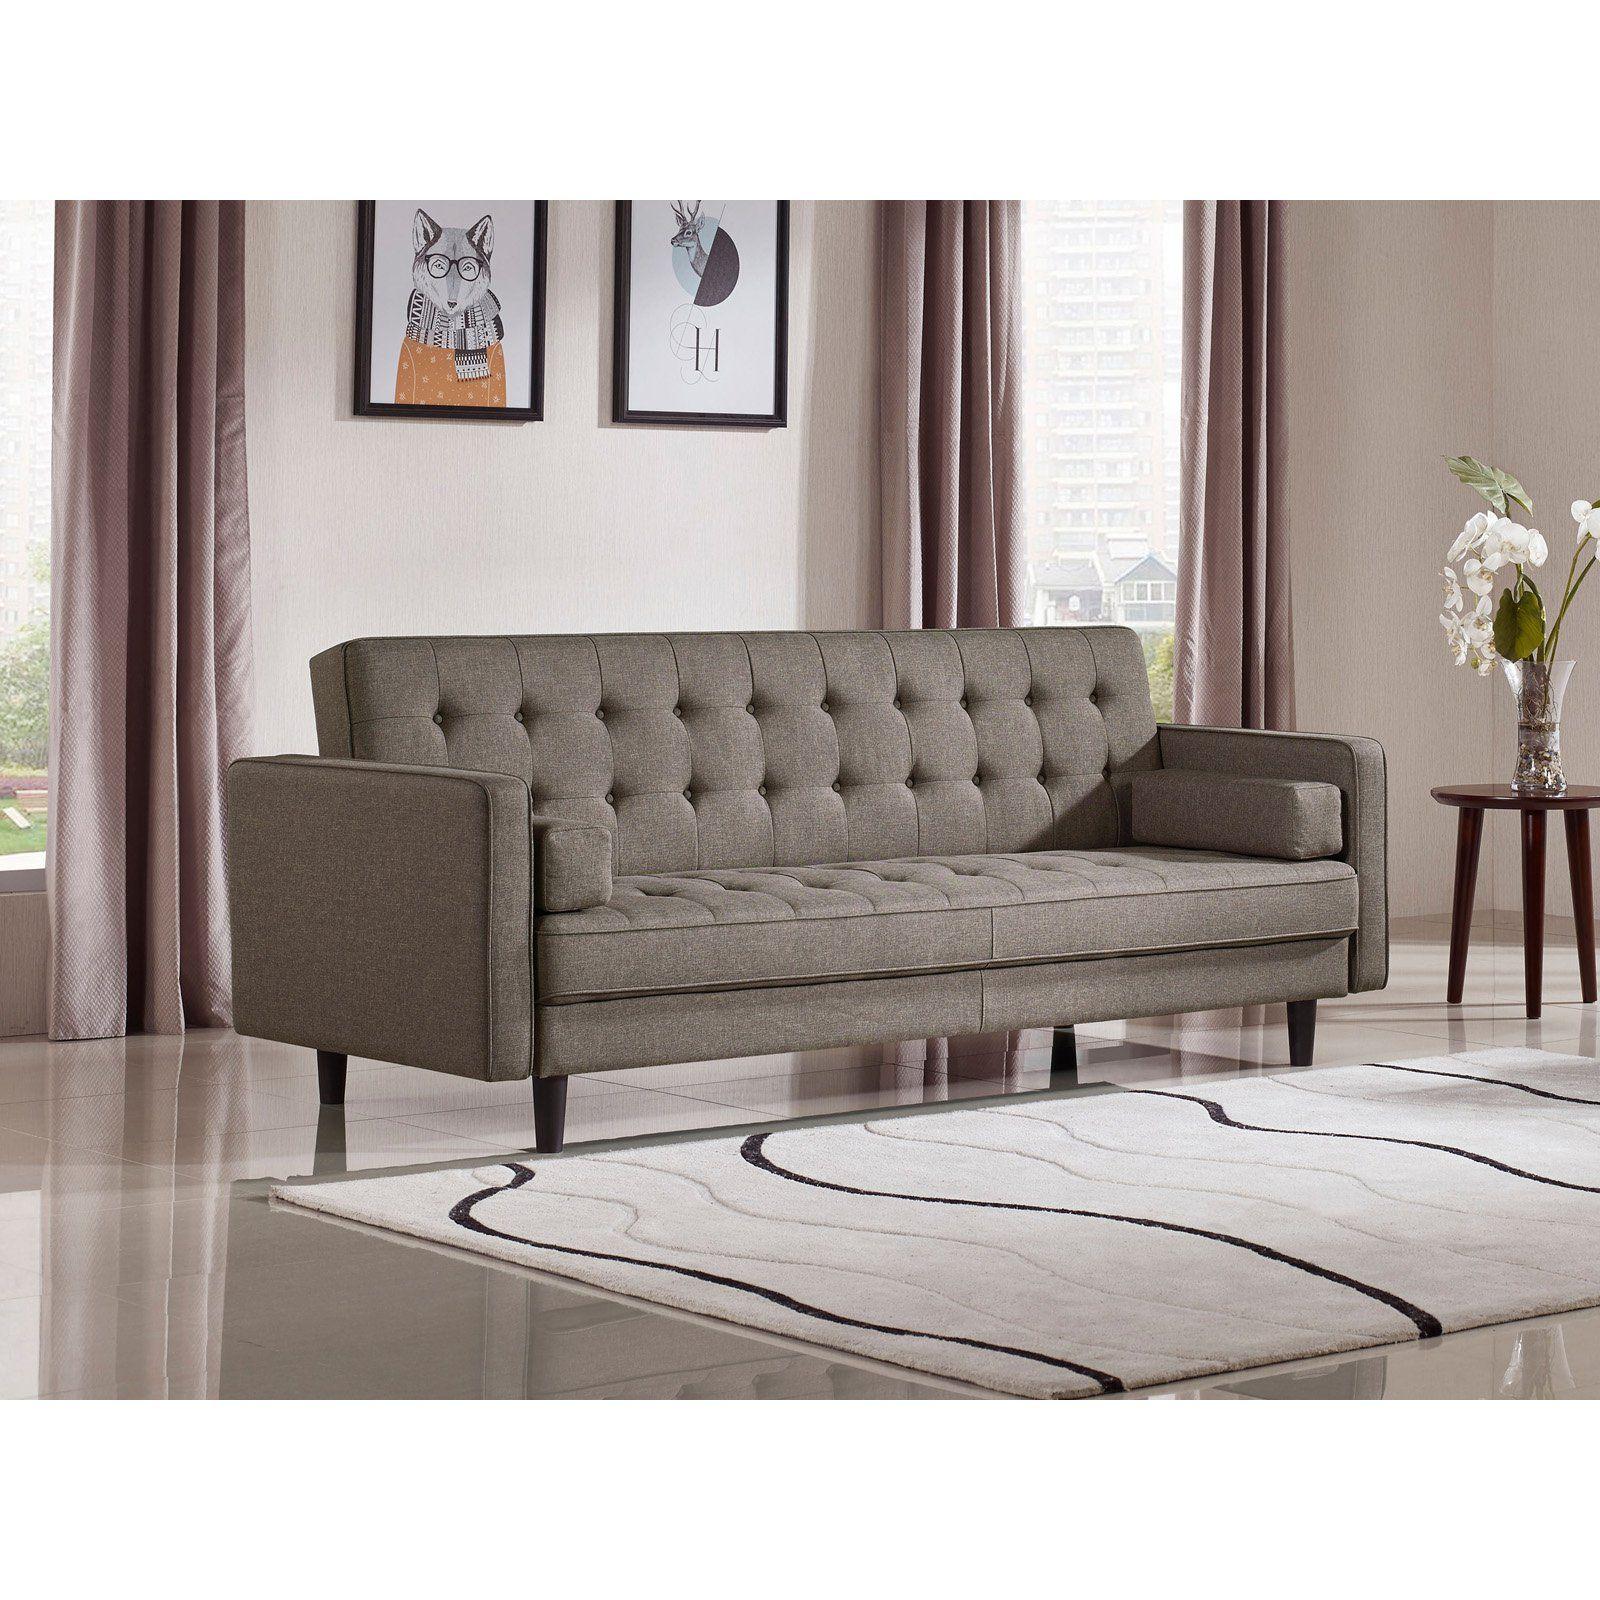 Diamond Sofa Express Convertible